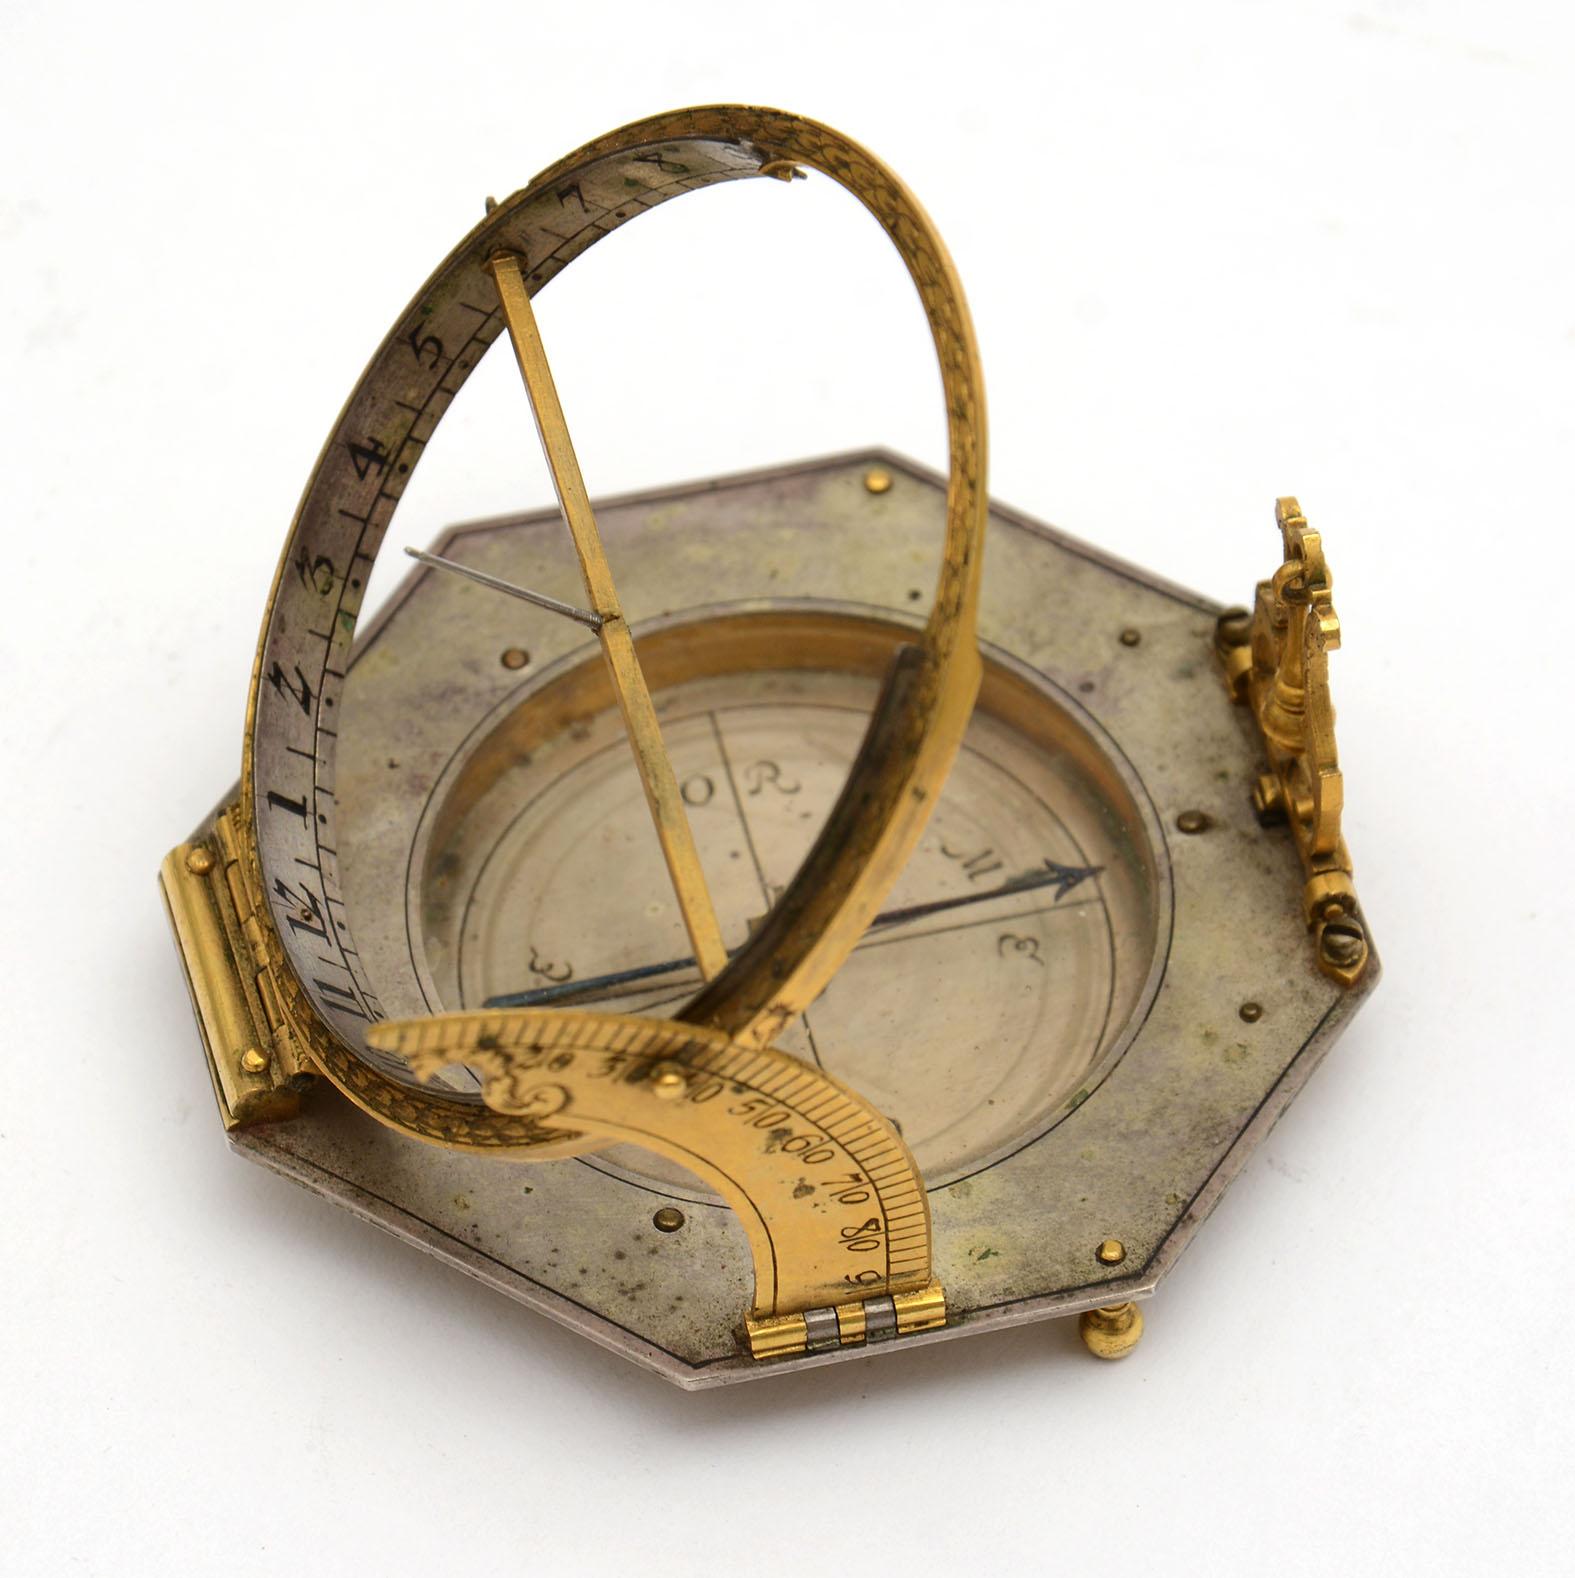 A fine equinoctial Compass Sundial by Johann Willebrand (c. 1658-1726)